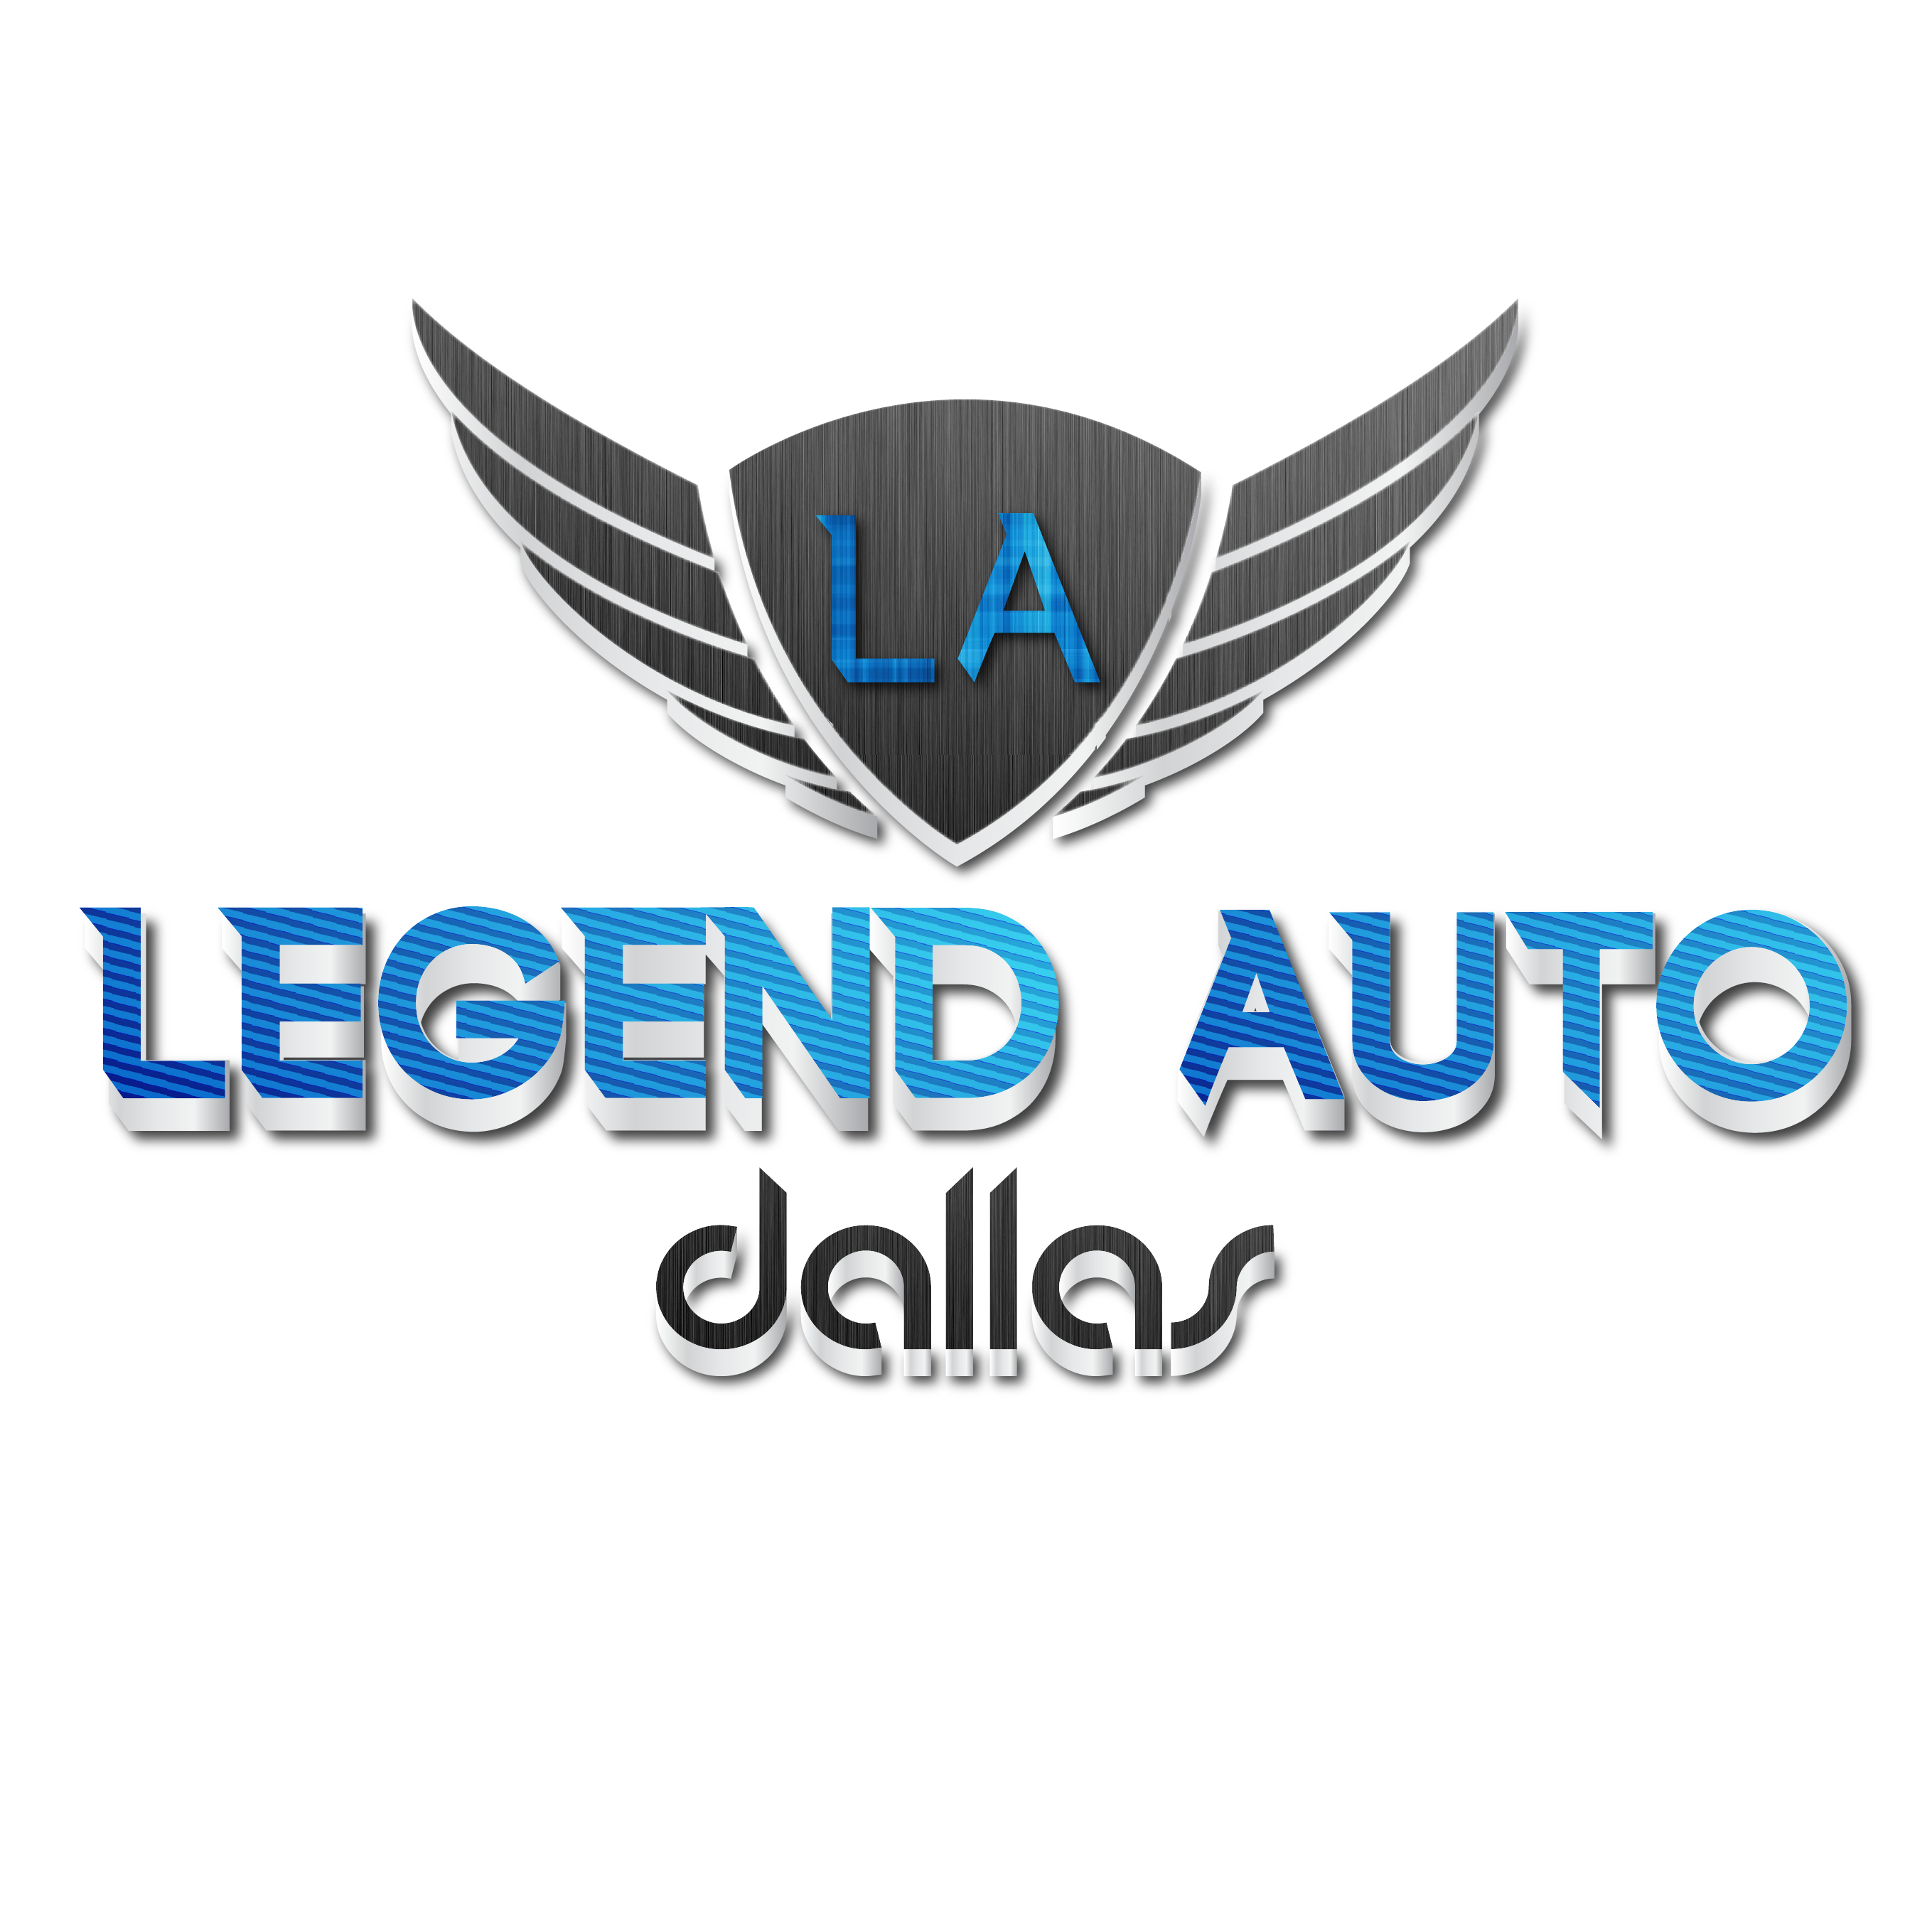 Legend Auto